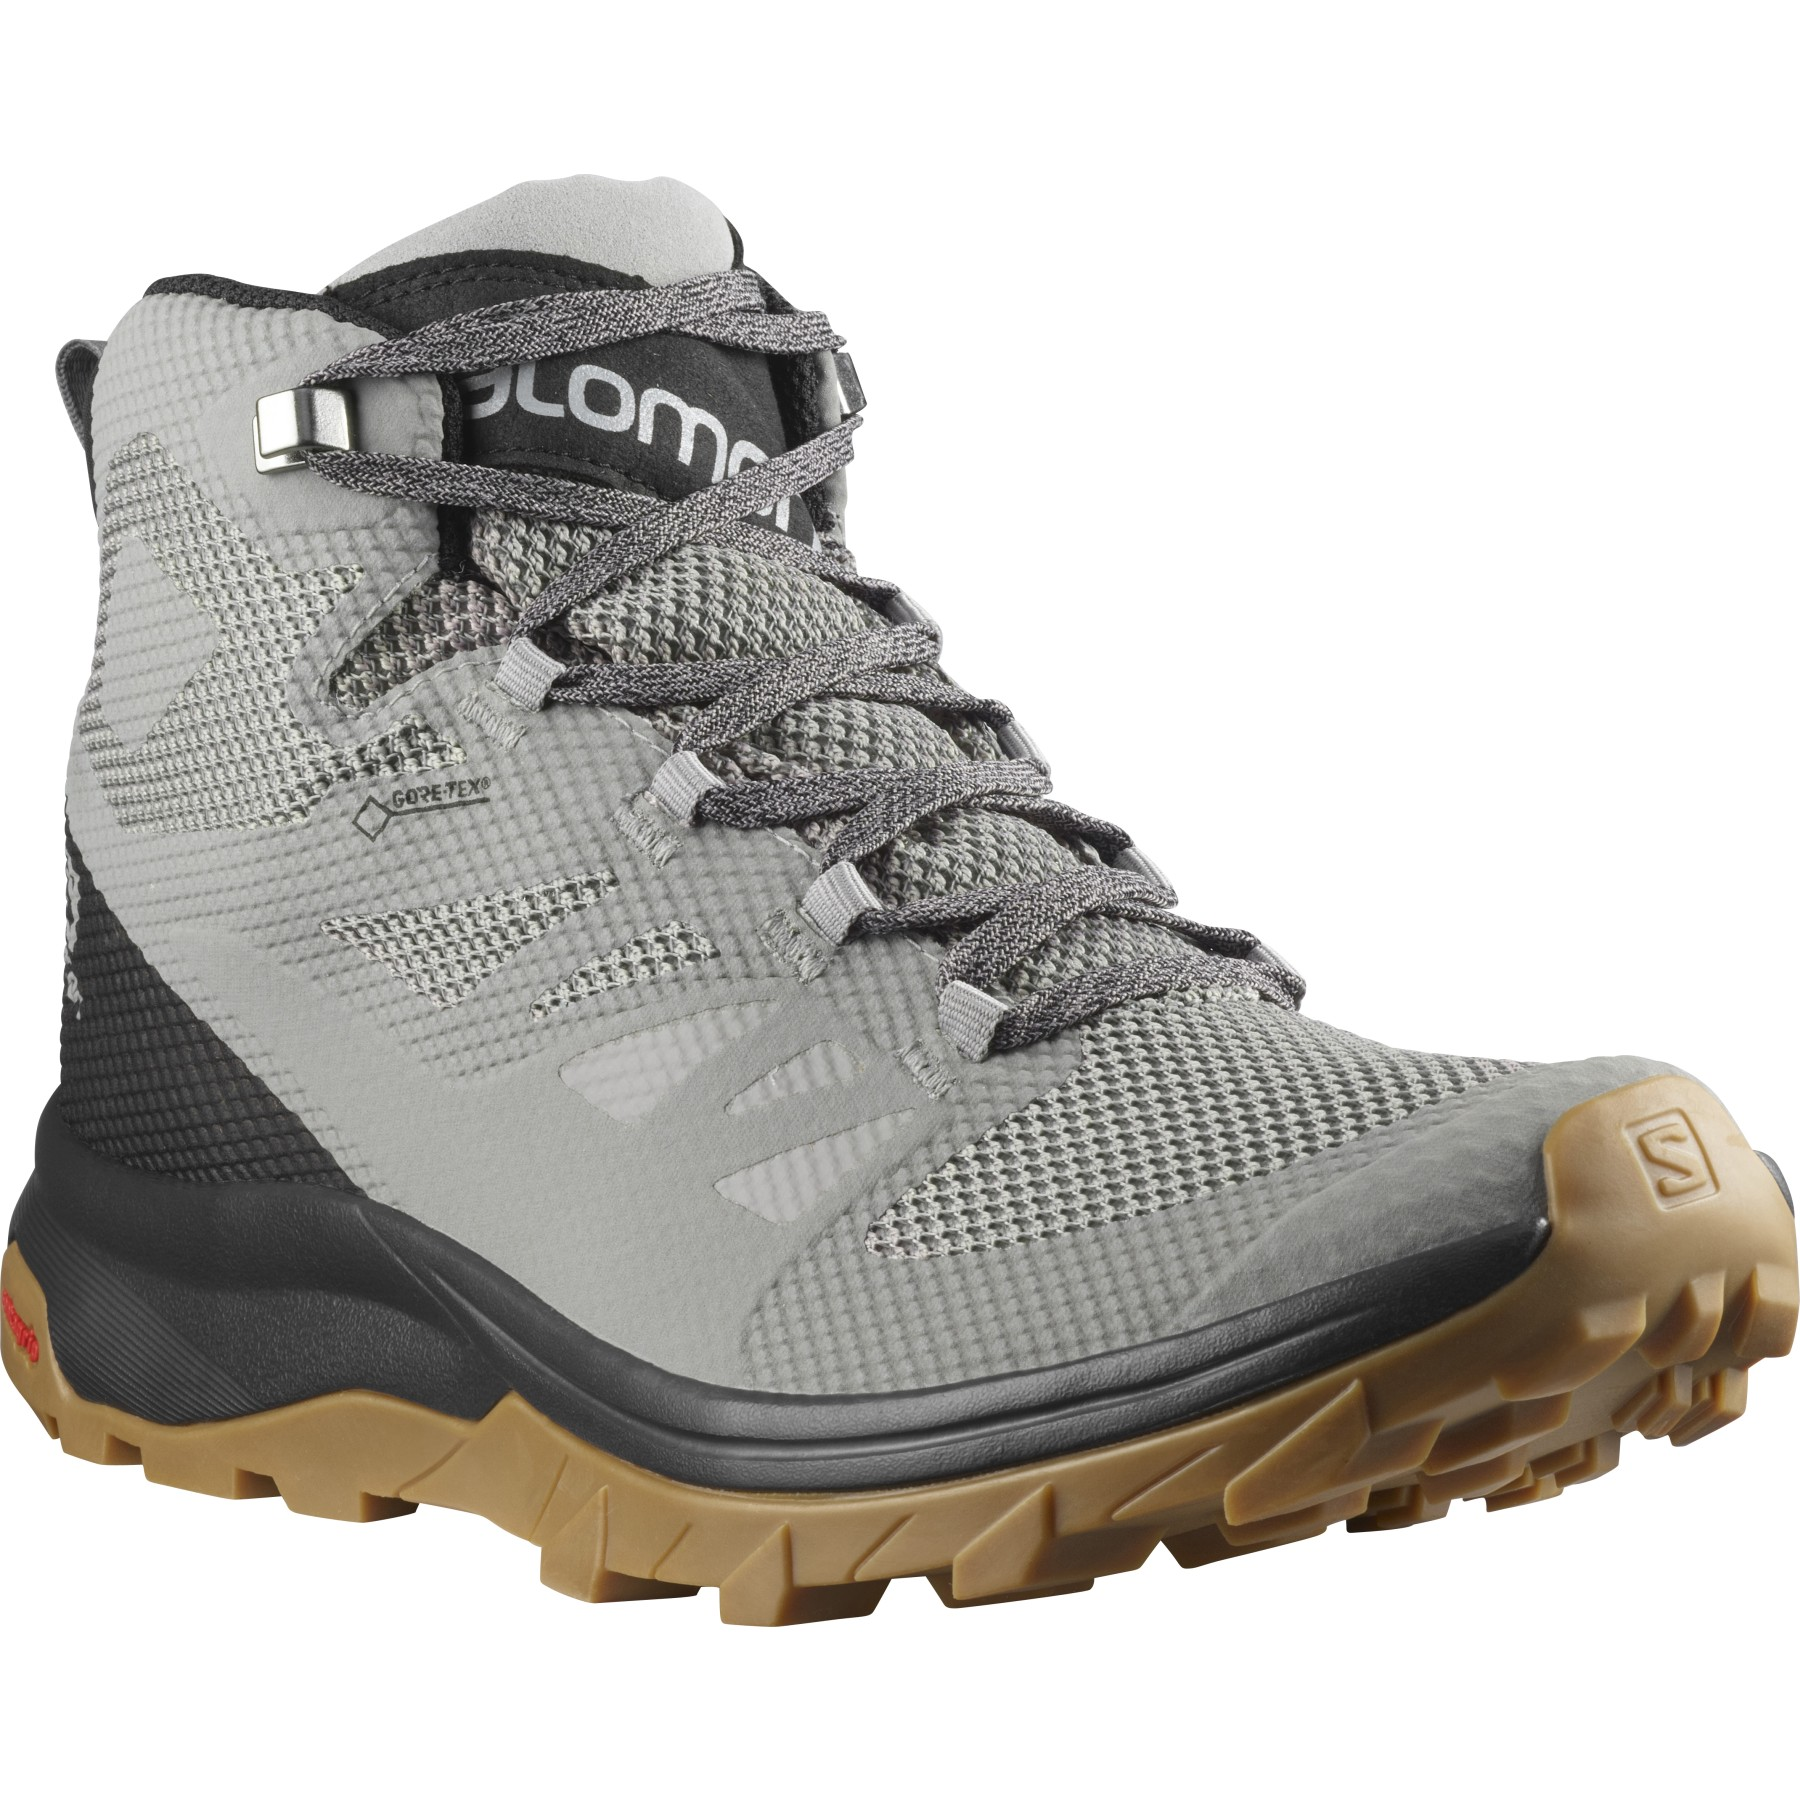 Salomon OUTline Mid GTX® Schuh - frost gray/black/alloy